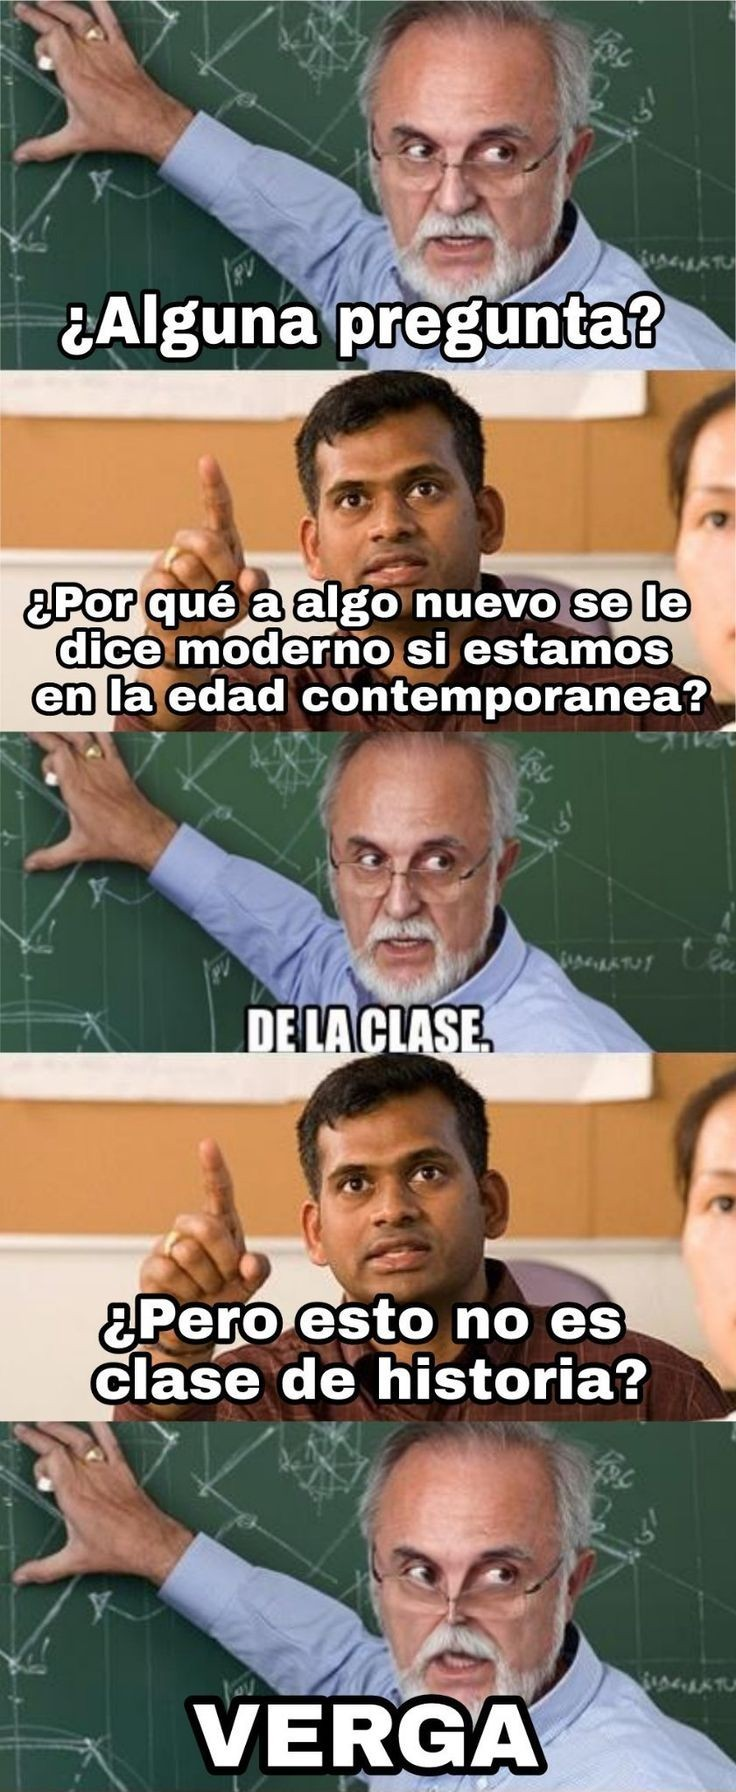 Moderno - meme